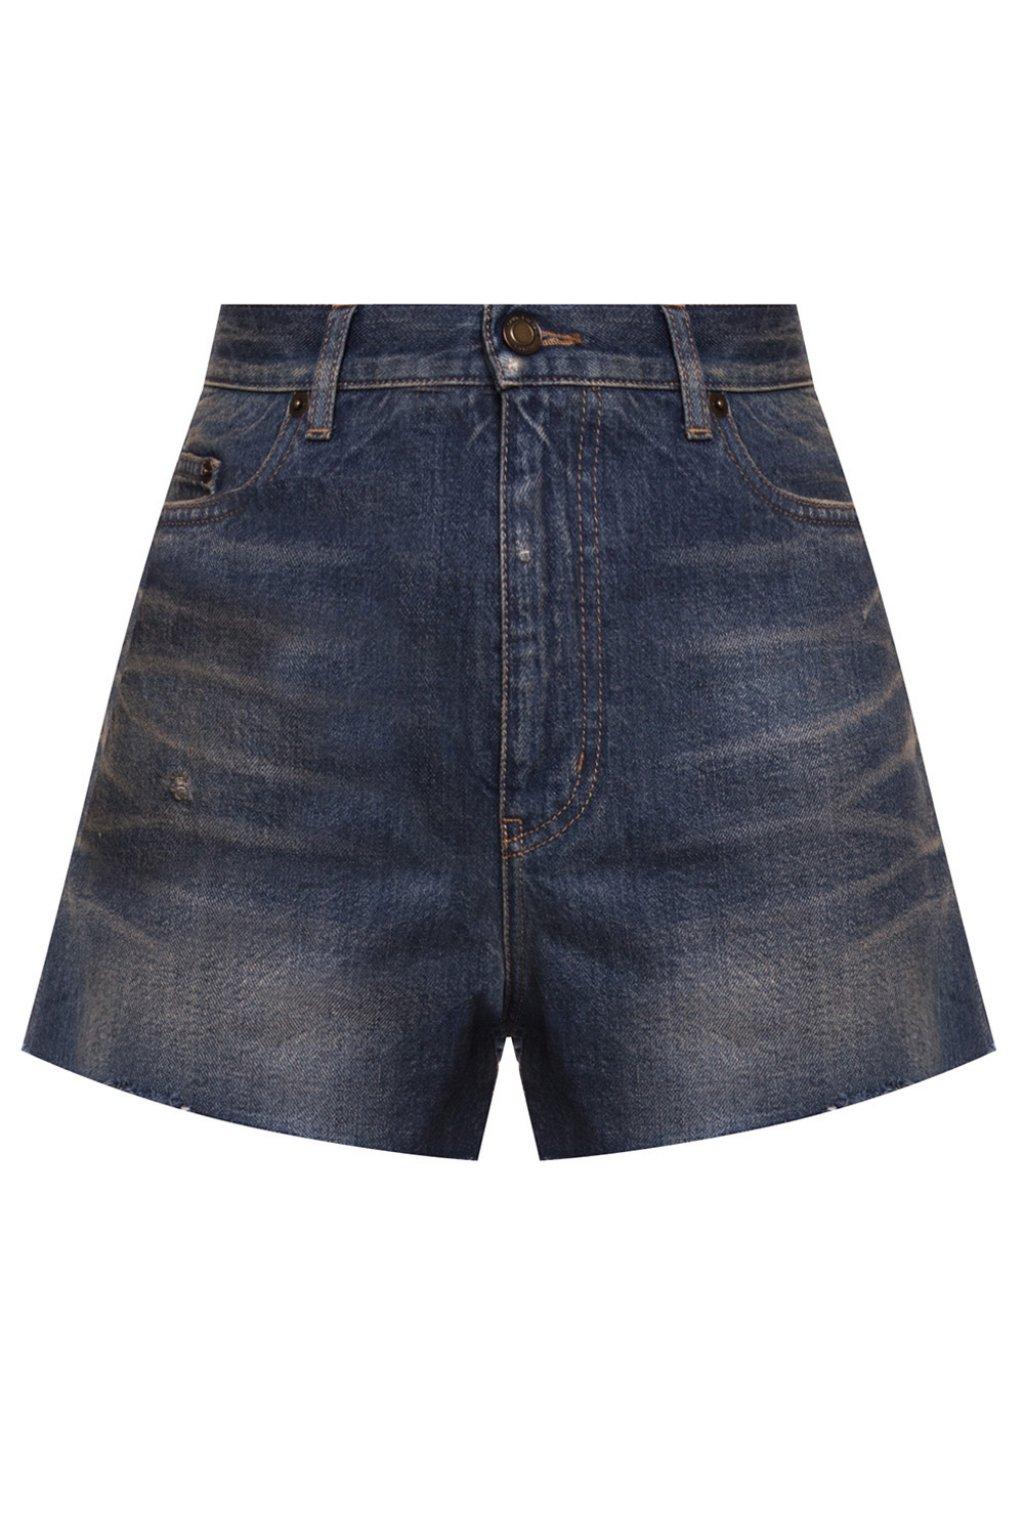 Saint Laurent Distressed denim shorts